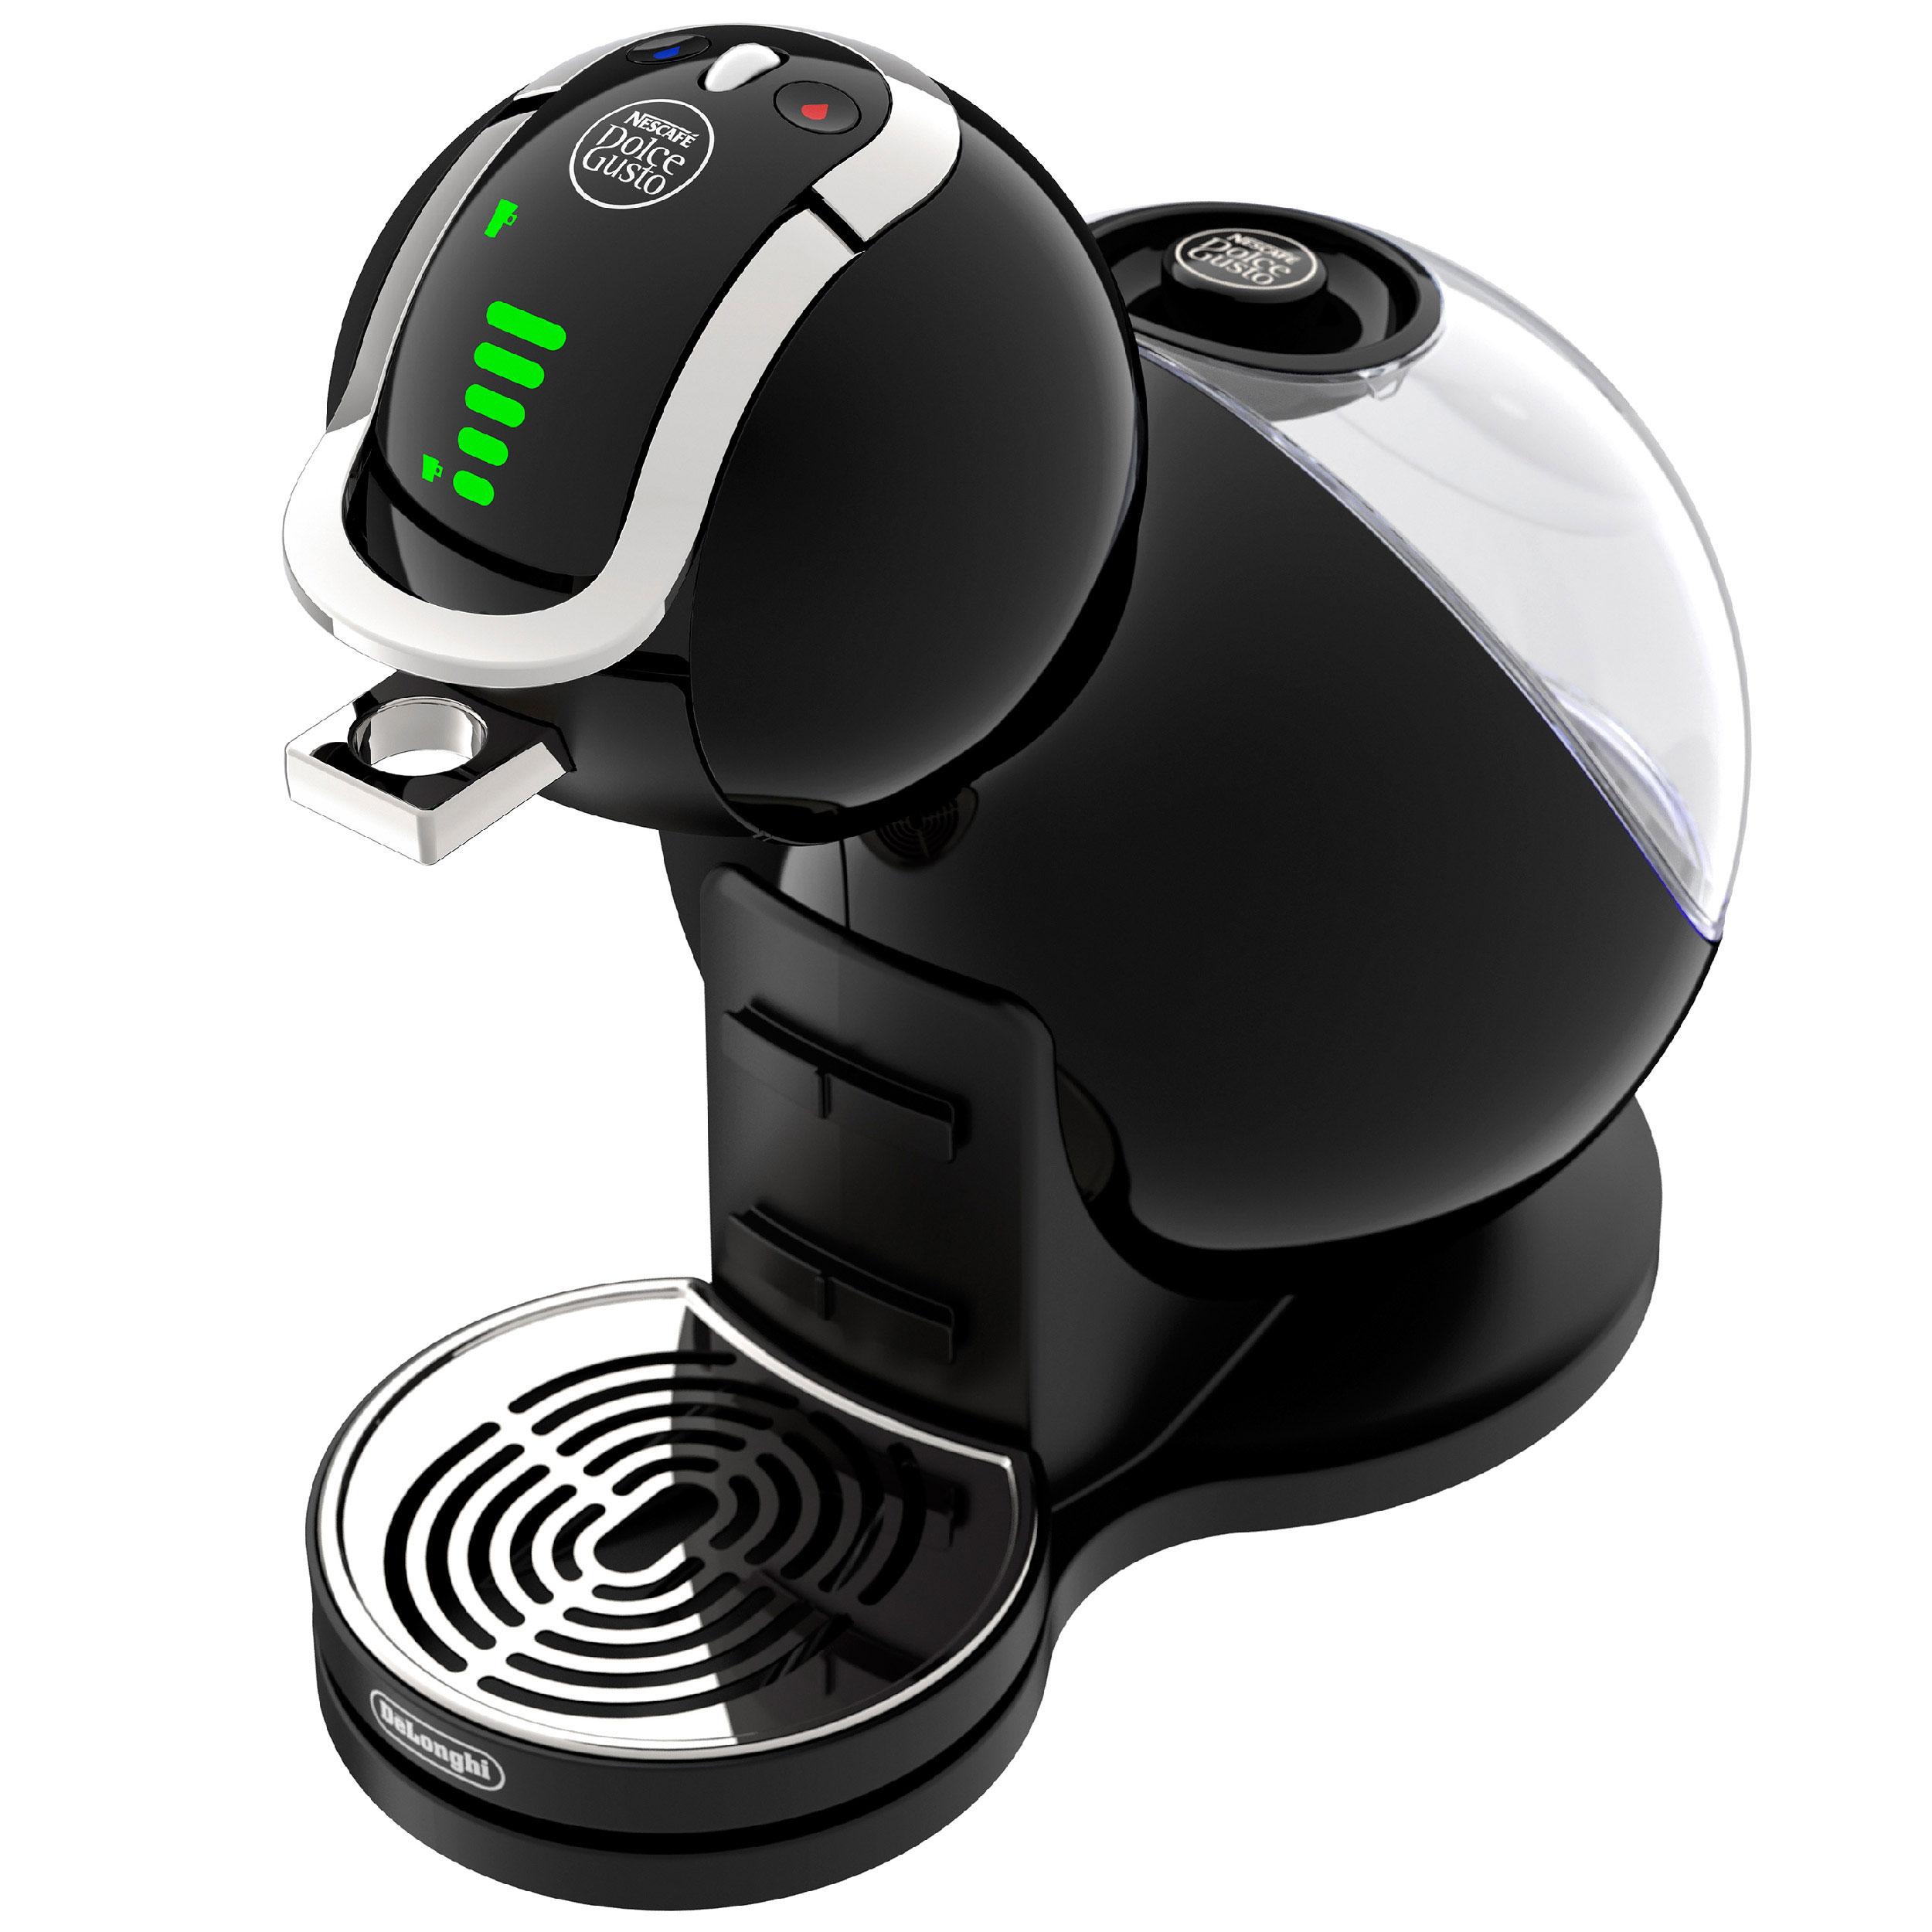 delonghi edg 625 b nescaf dolce gusto melody 3 automatic capsule machine coffee machine. Black Bedroom Furniture Sets. Home Design Ideas